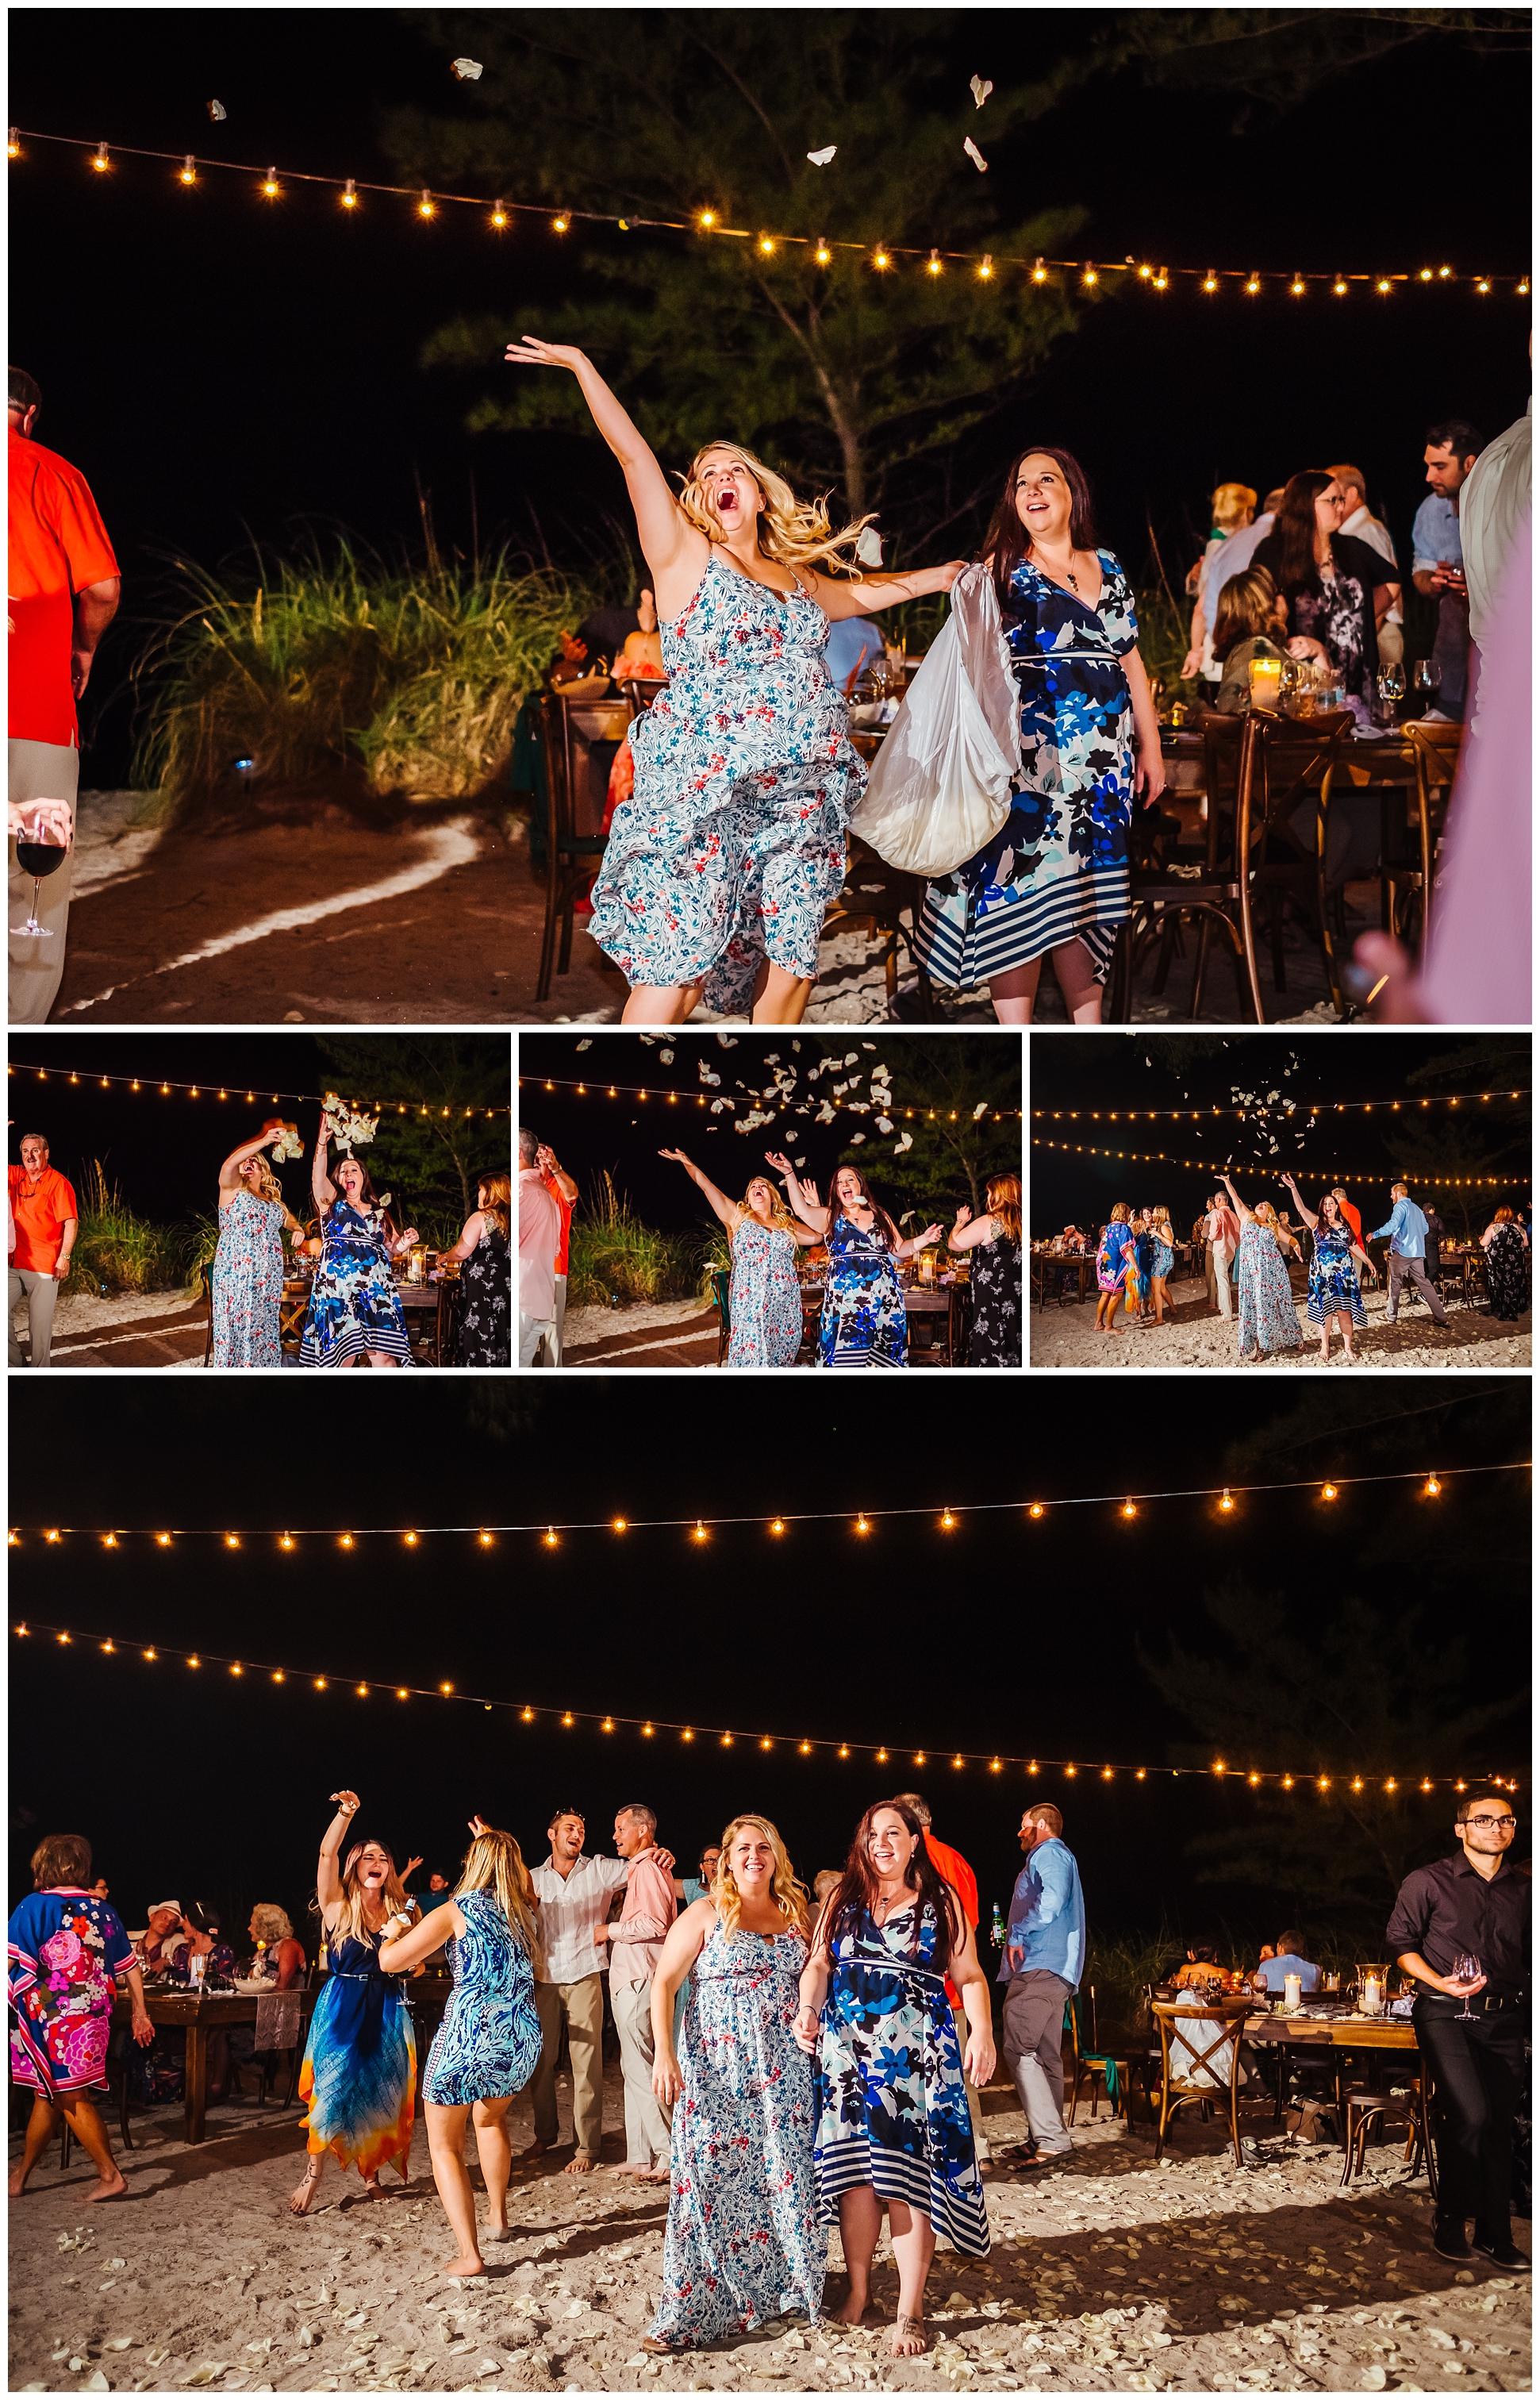 tampa-st-pete-wedding-photographer-indian-rocks-beach-mermaid-train-redhead_0180.jpg